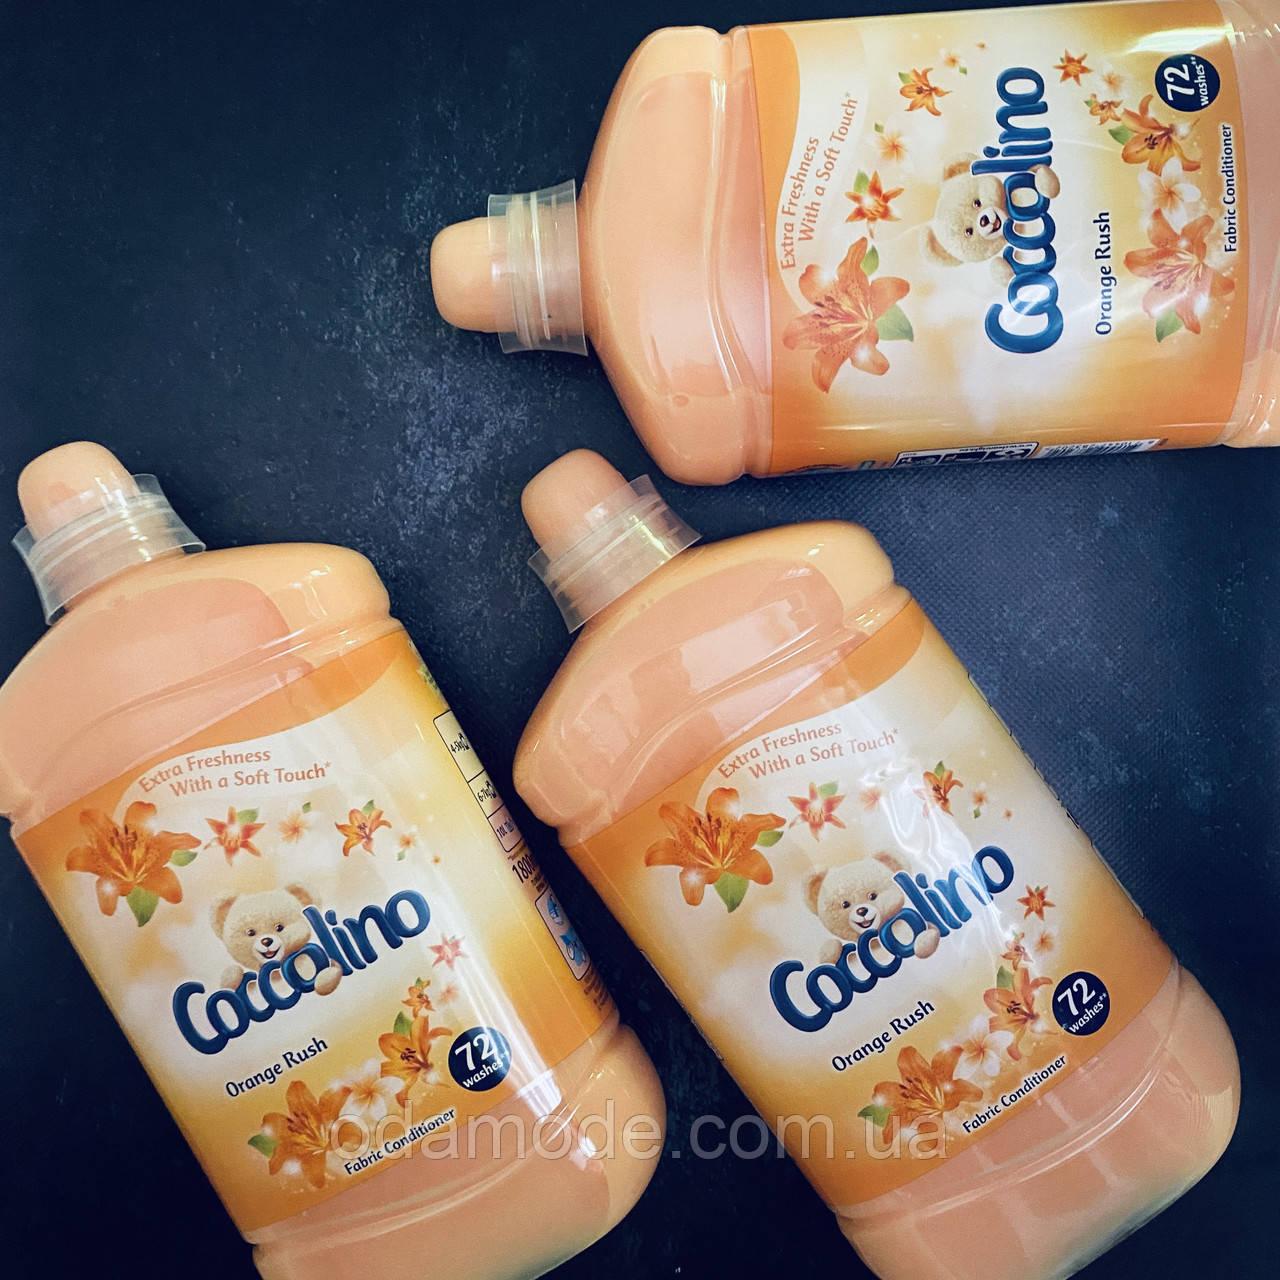 Ополаскиватель для белья Coccolino(Нидерланды) Orange Rush 1.8л 72 стирки